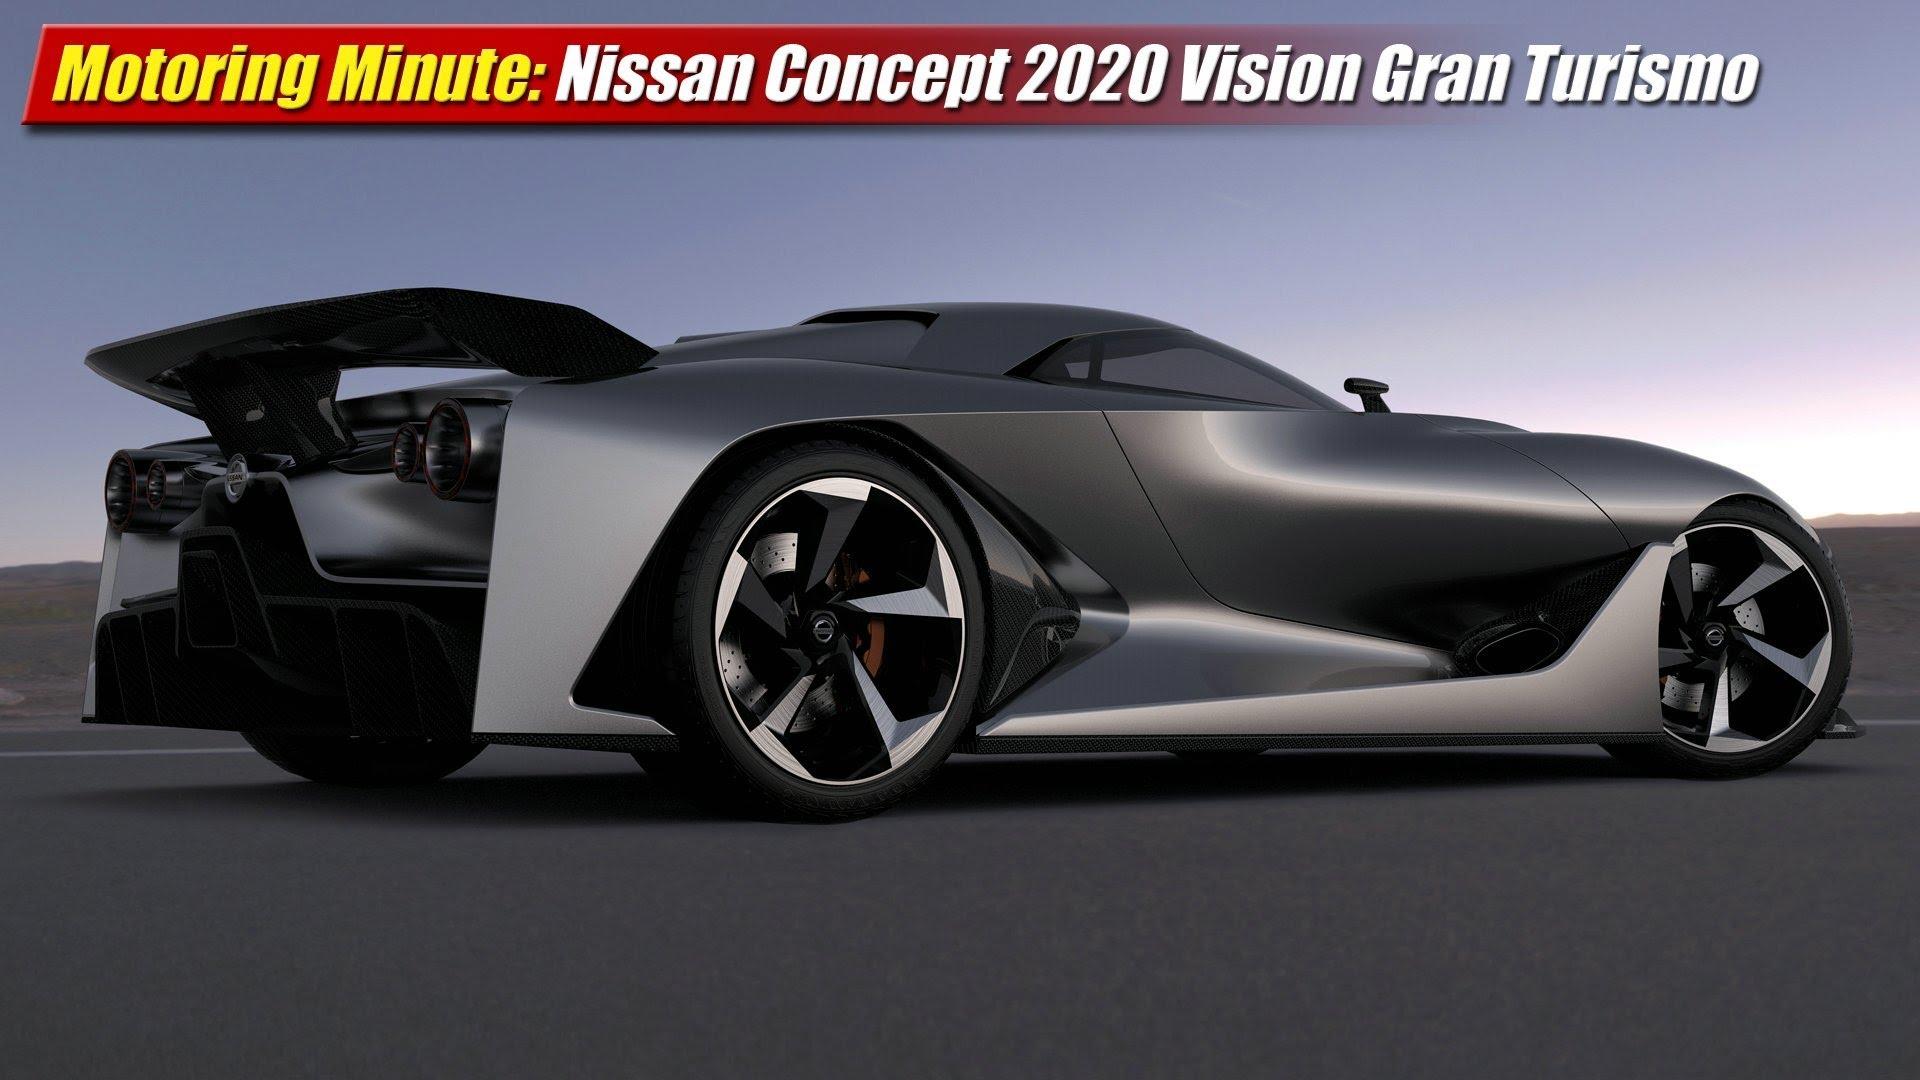 Motoring Minute: Nissan 2020 Vision Concept Gran Turismo